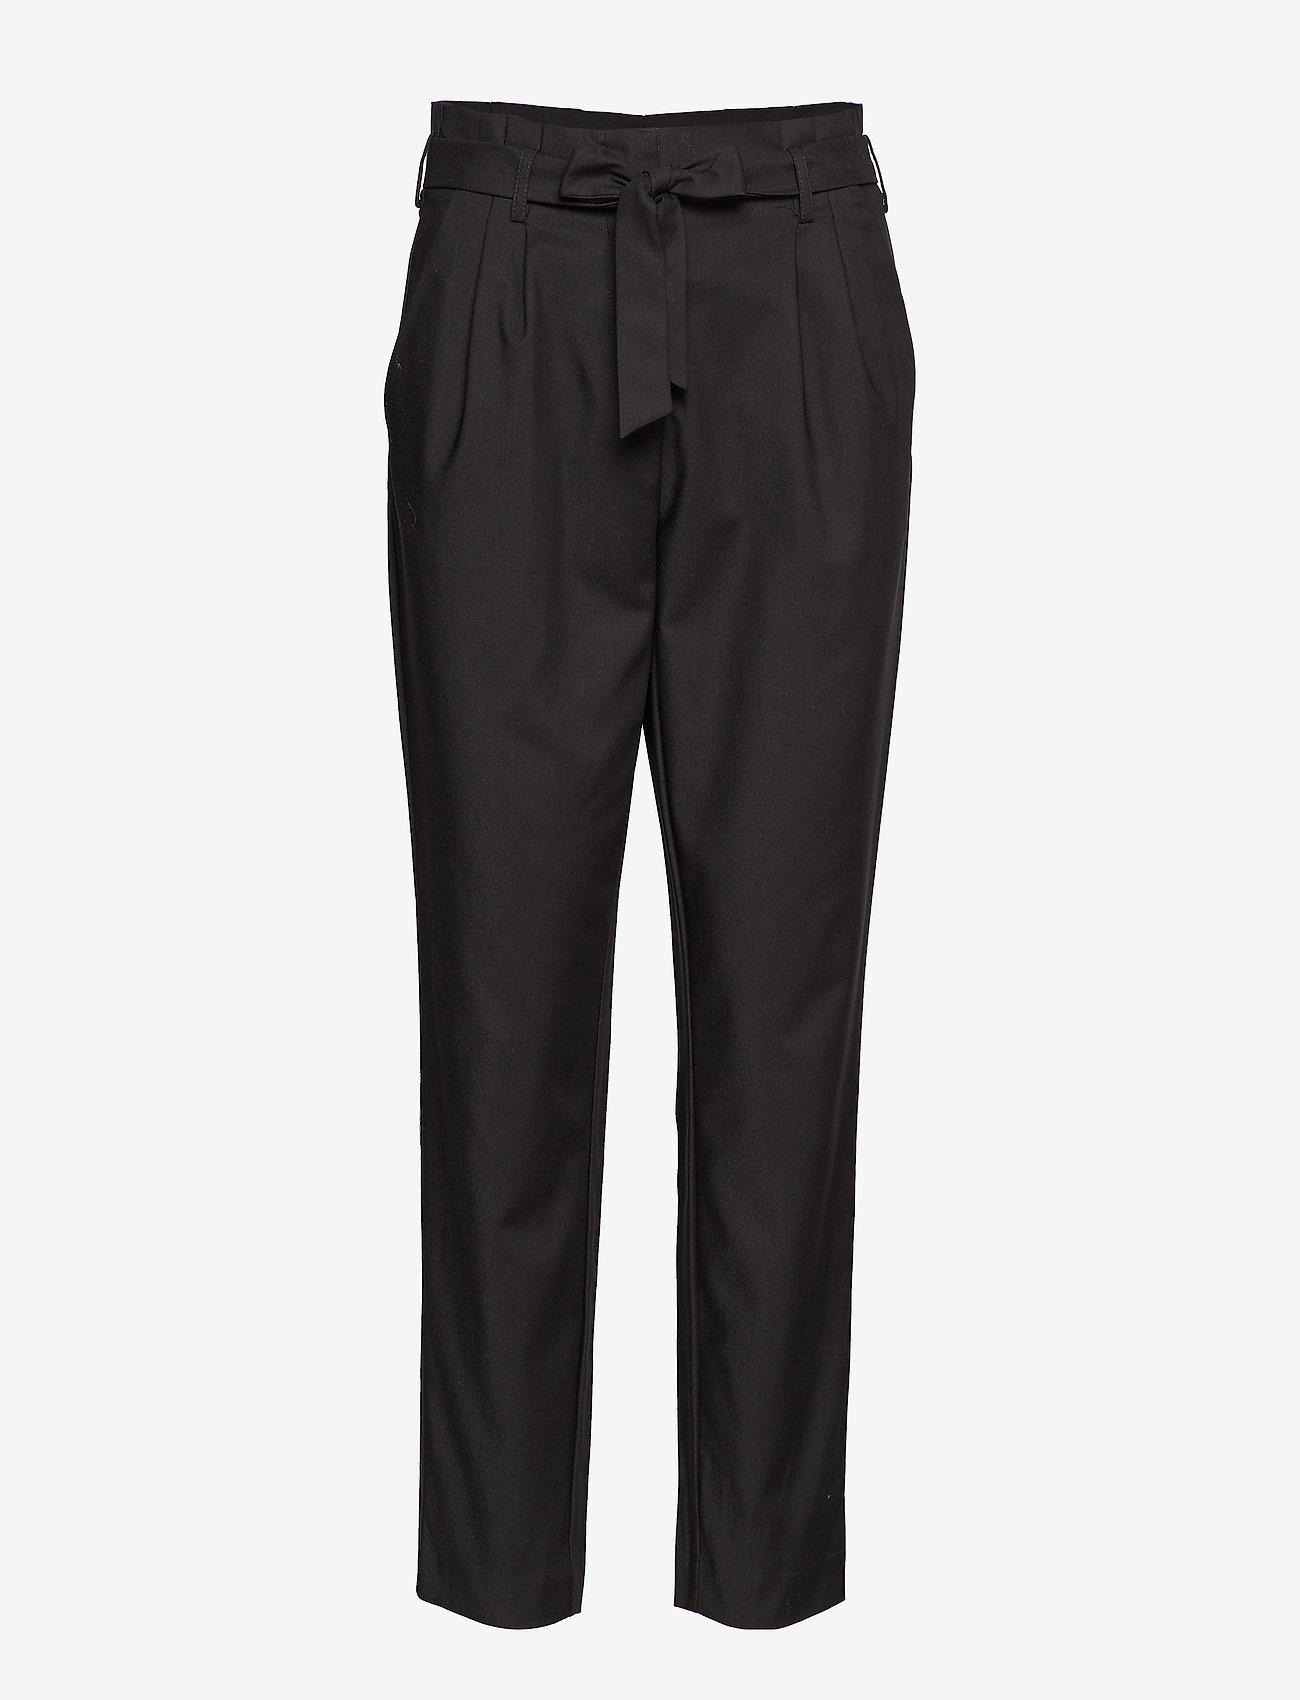 Vila - VISOFINA HWRE 7/8 PANT-NOOS - wide leg trousers - black - 0